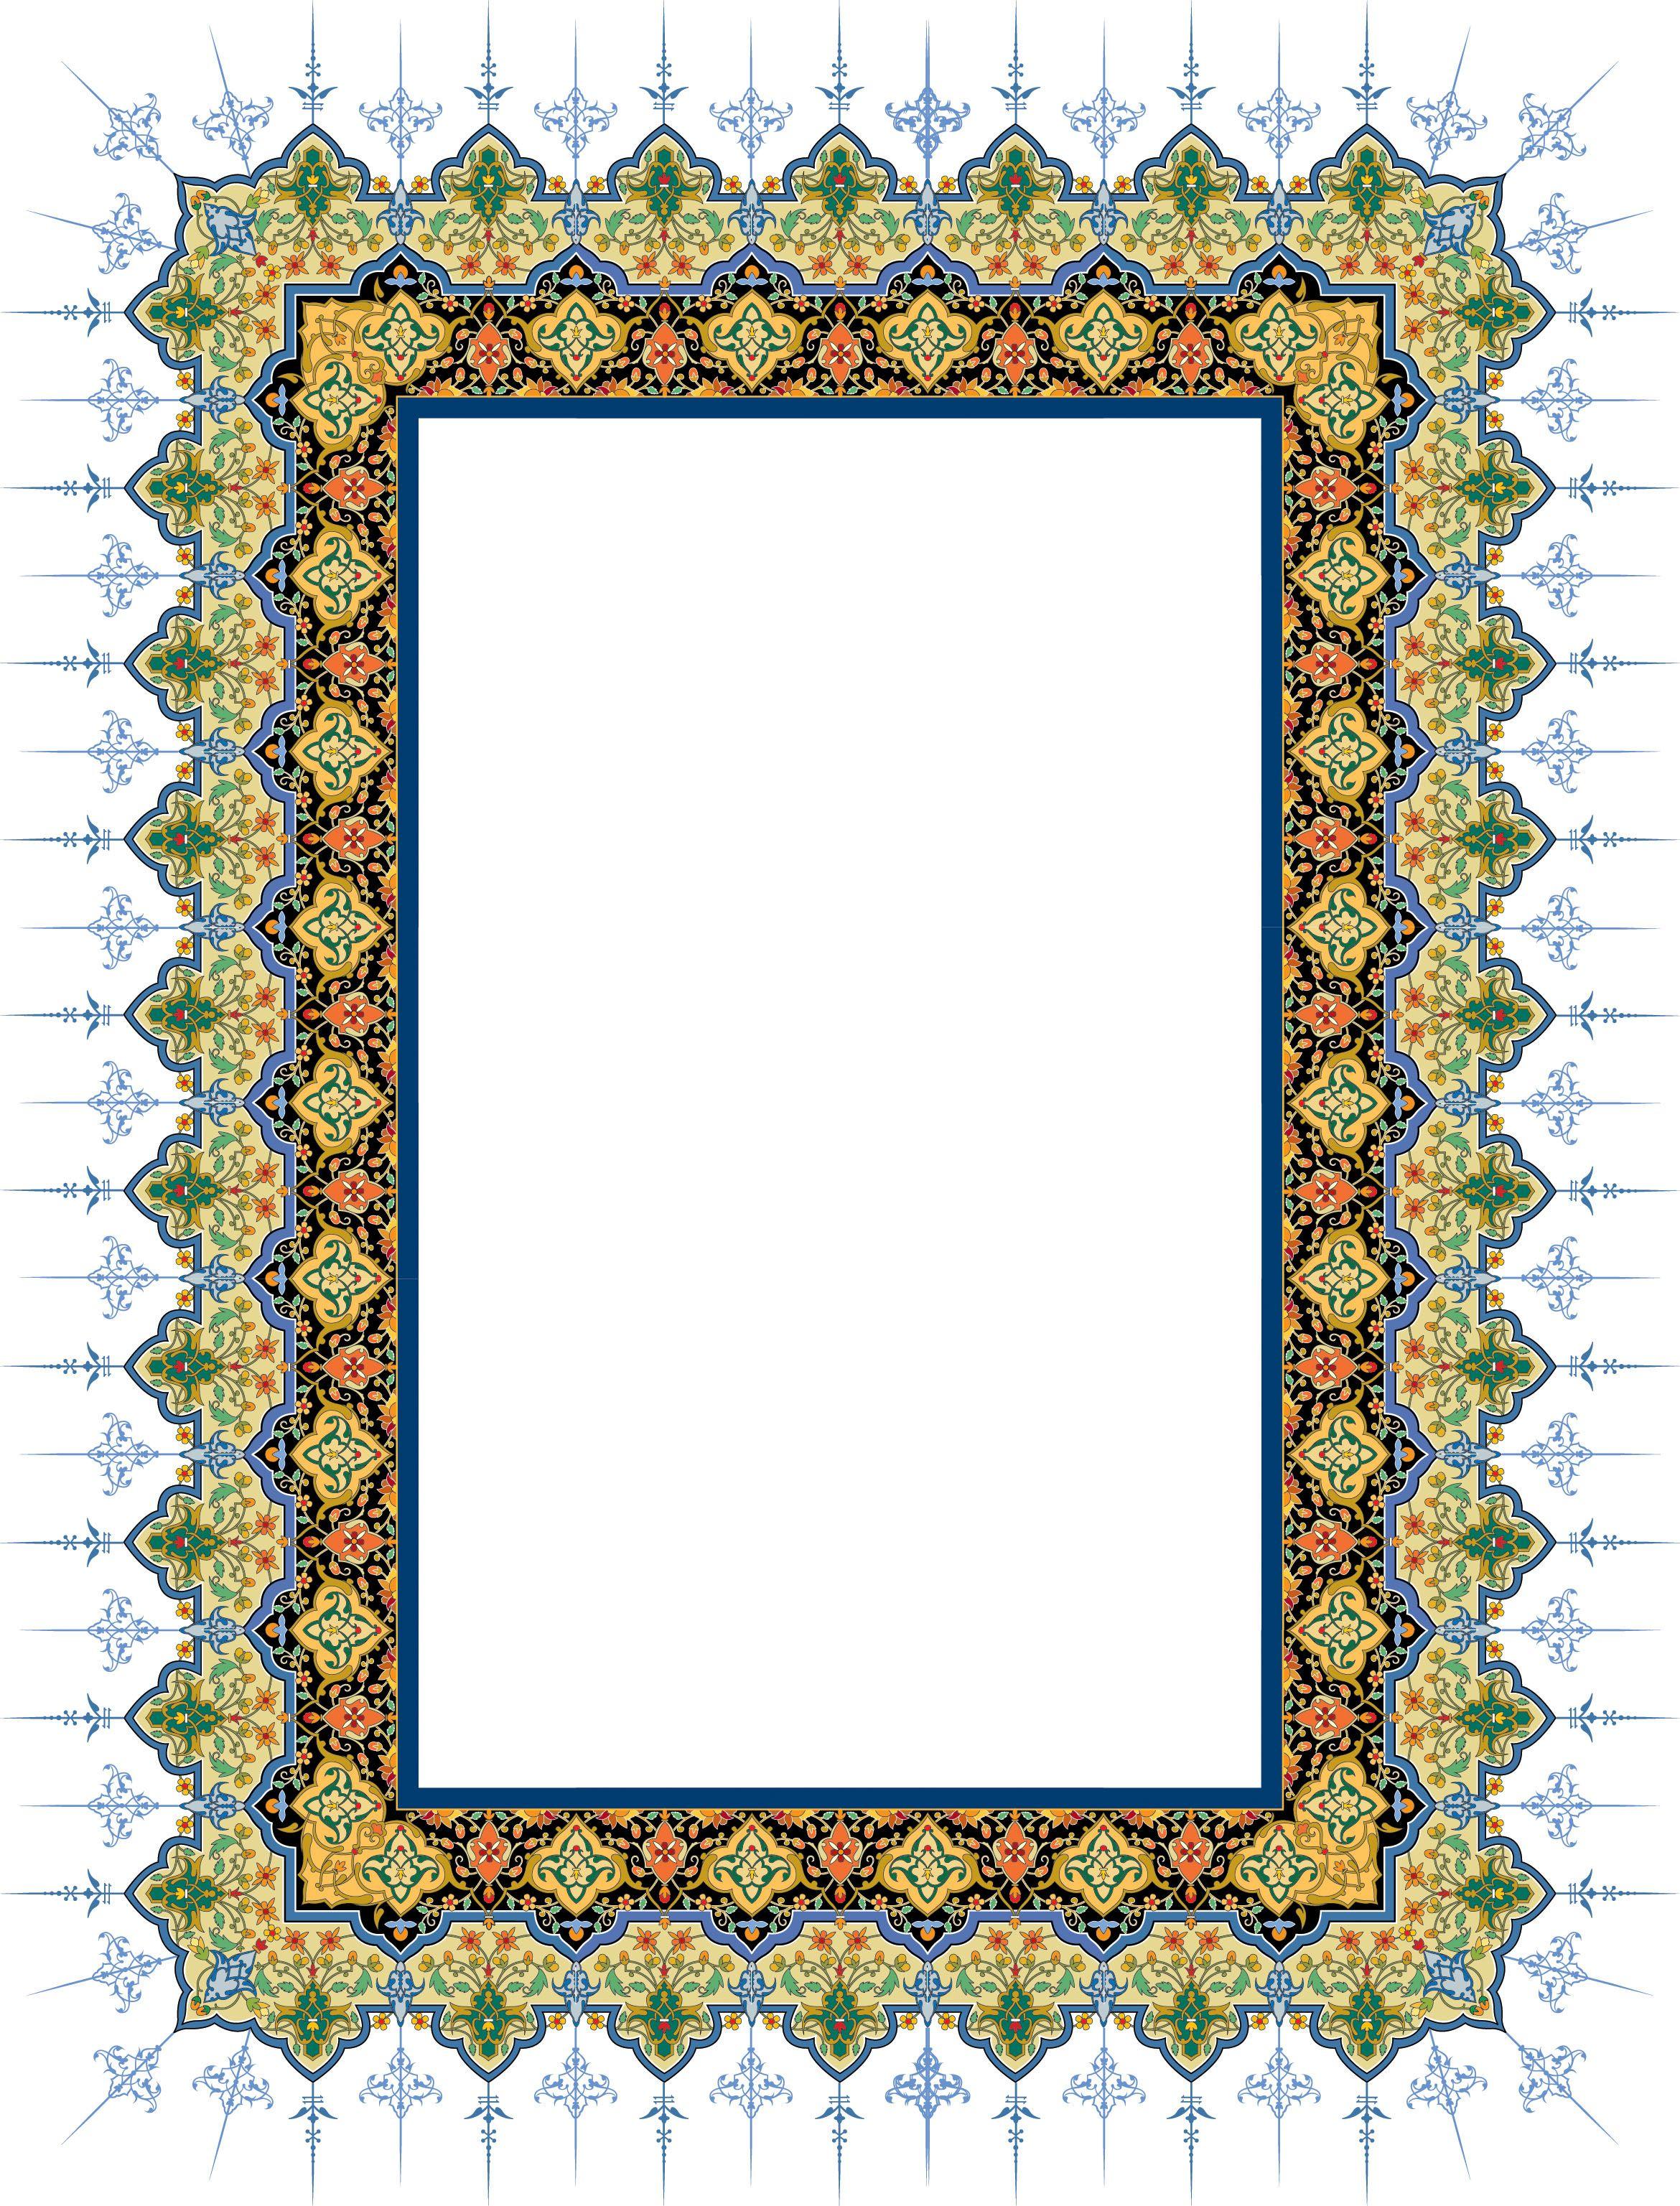 22 floral pattern khatai seni kaligrafi seni arab seni 22 floral pattern khatai seni